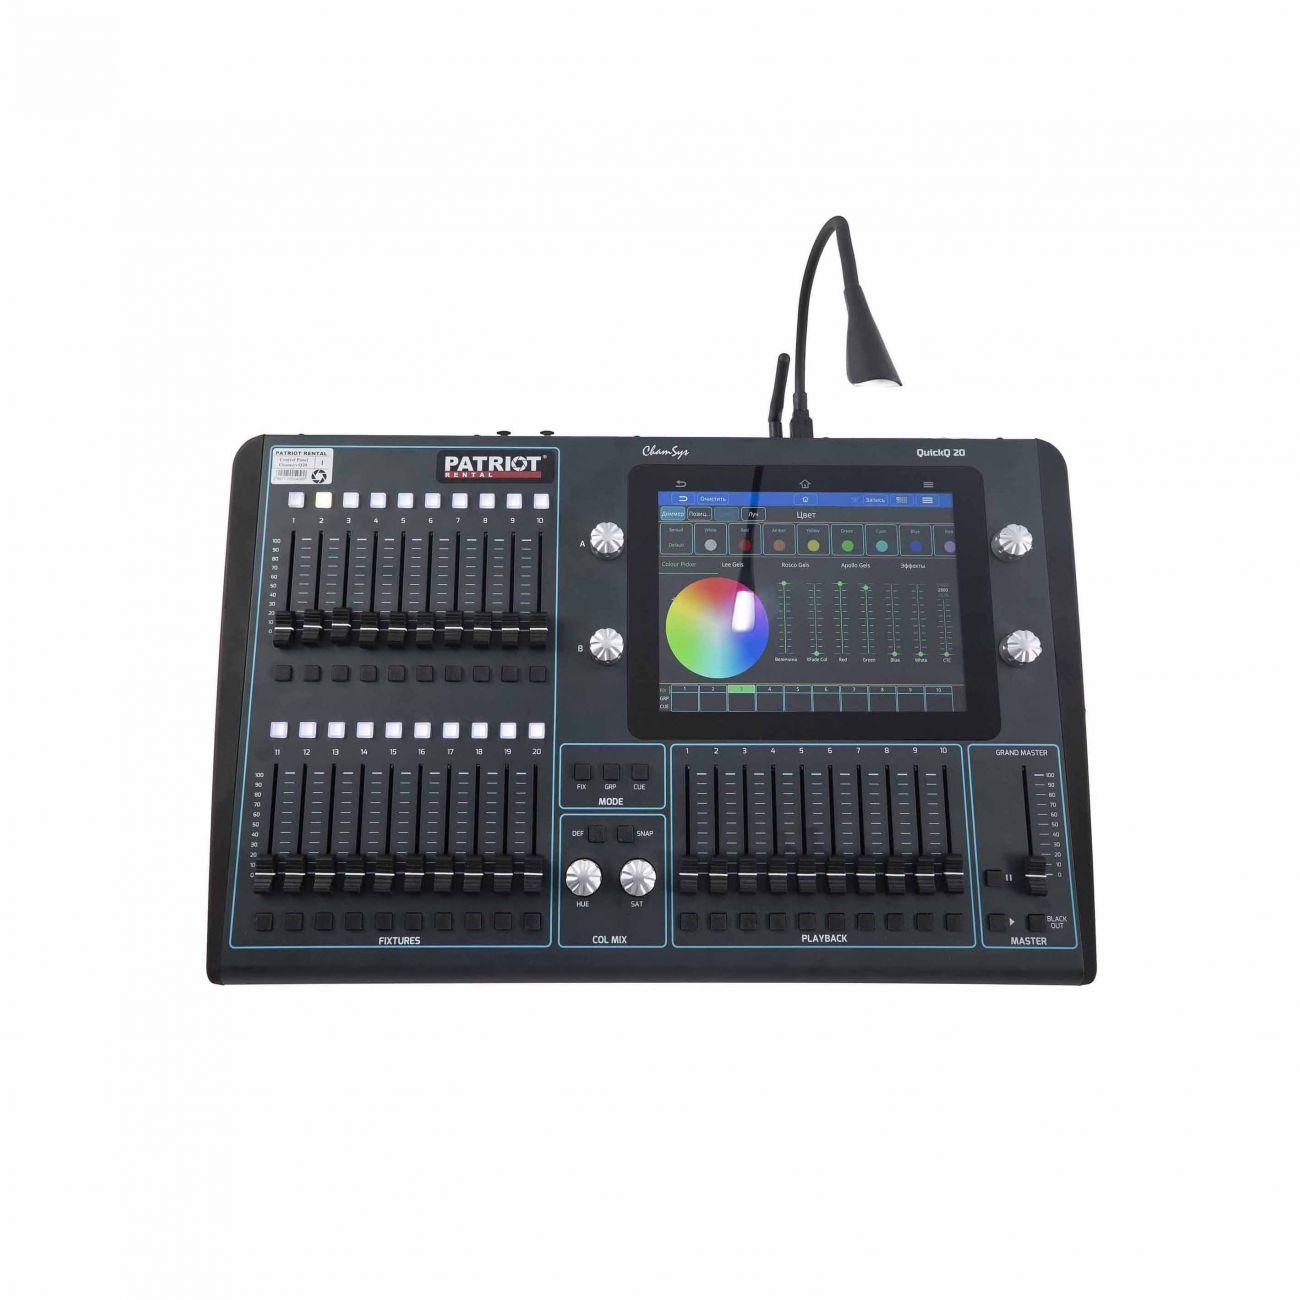 ARRI SkyPanel Control Panel Chamsys Quick Q20 1024 channel